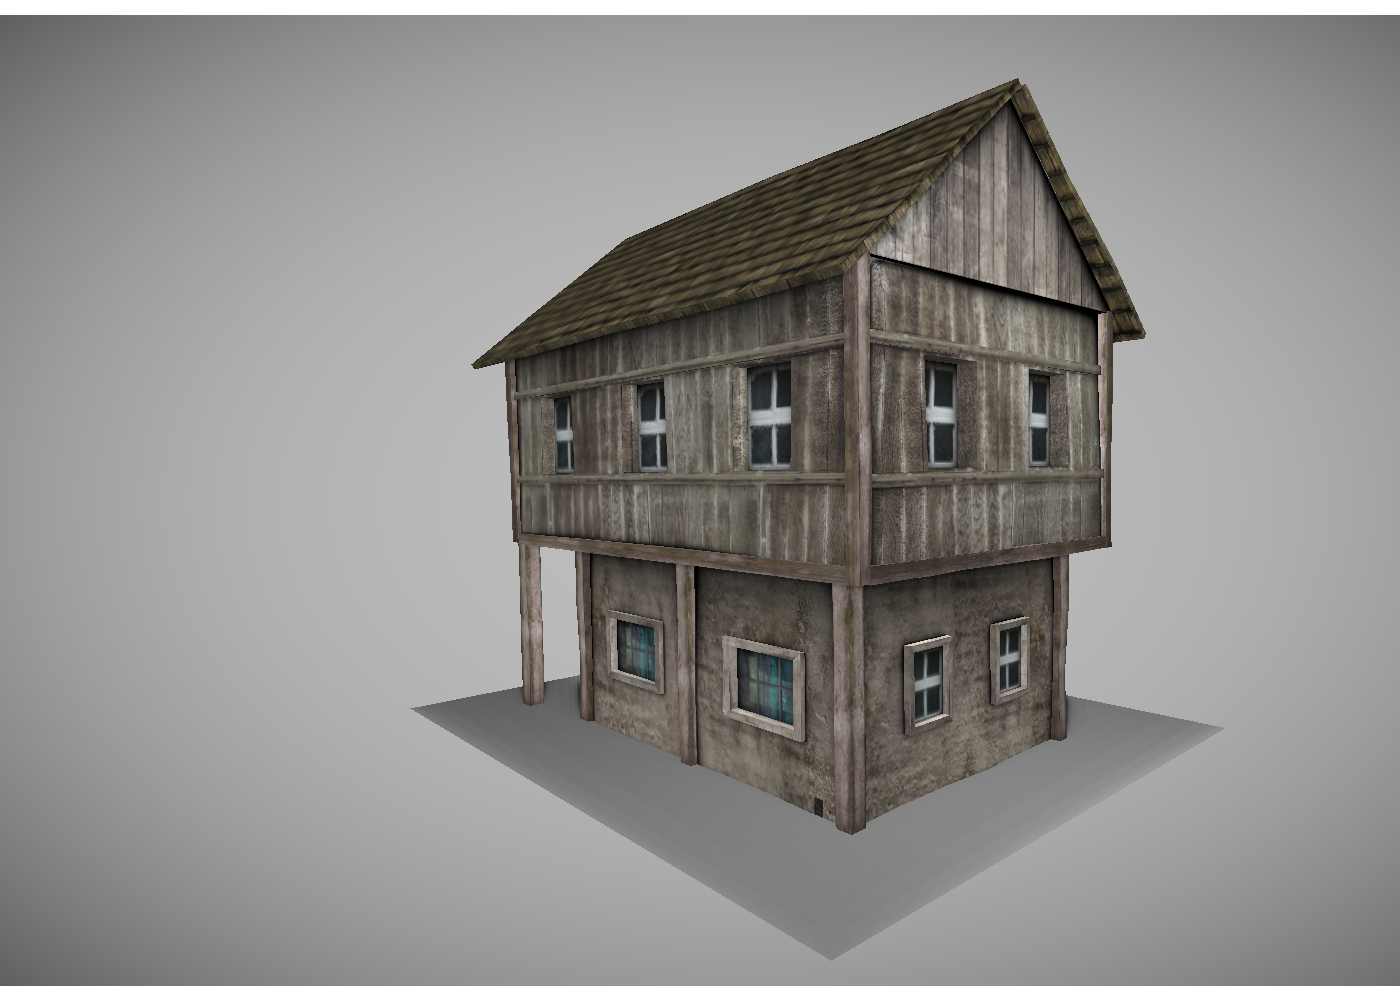 low poly medieval house 3d model in buildings 3dexport - 3d Model Of House